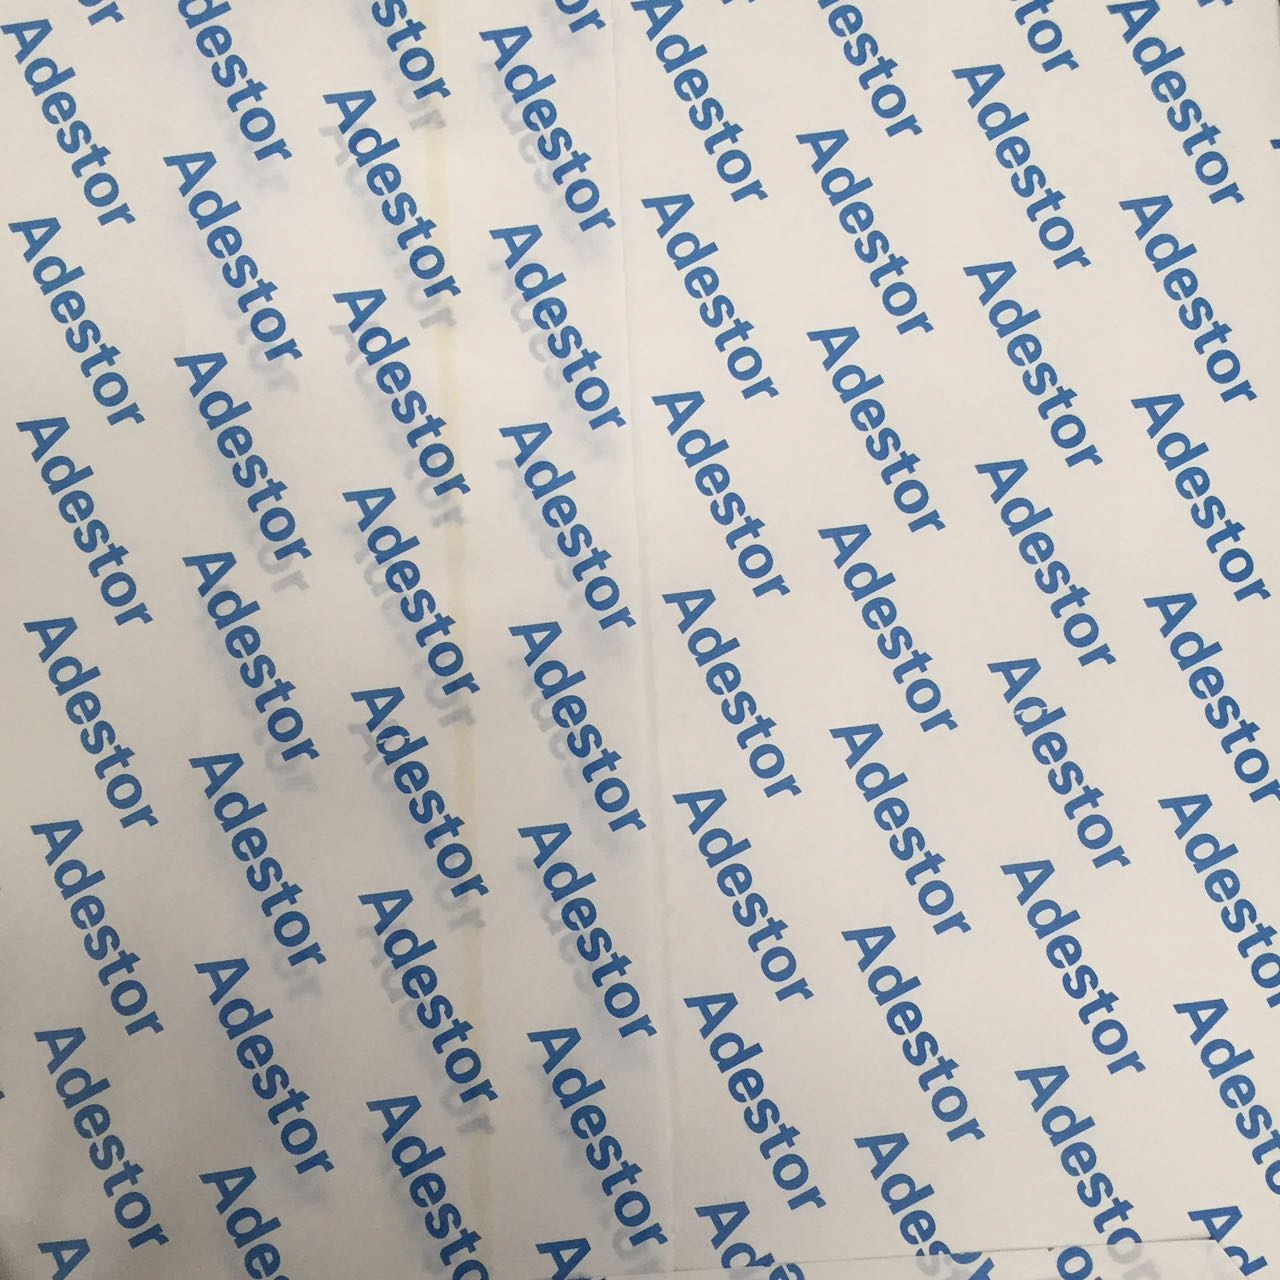 Samolepiaci papier 80g B2 50x70 cm 100 ks